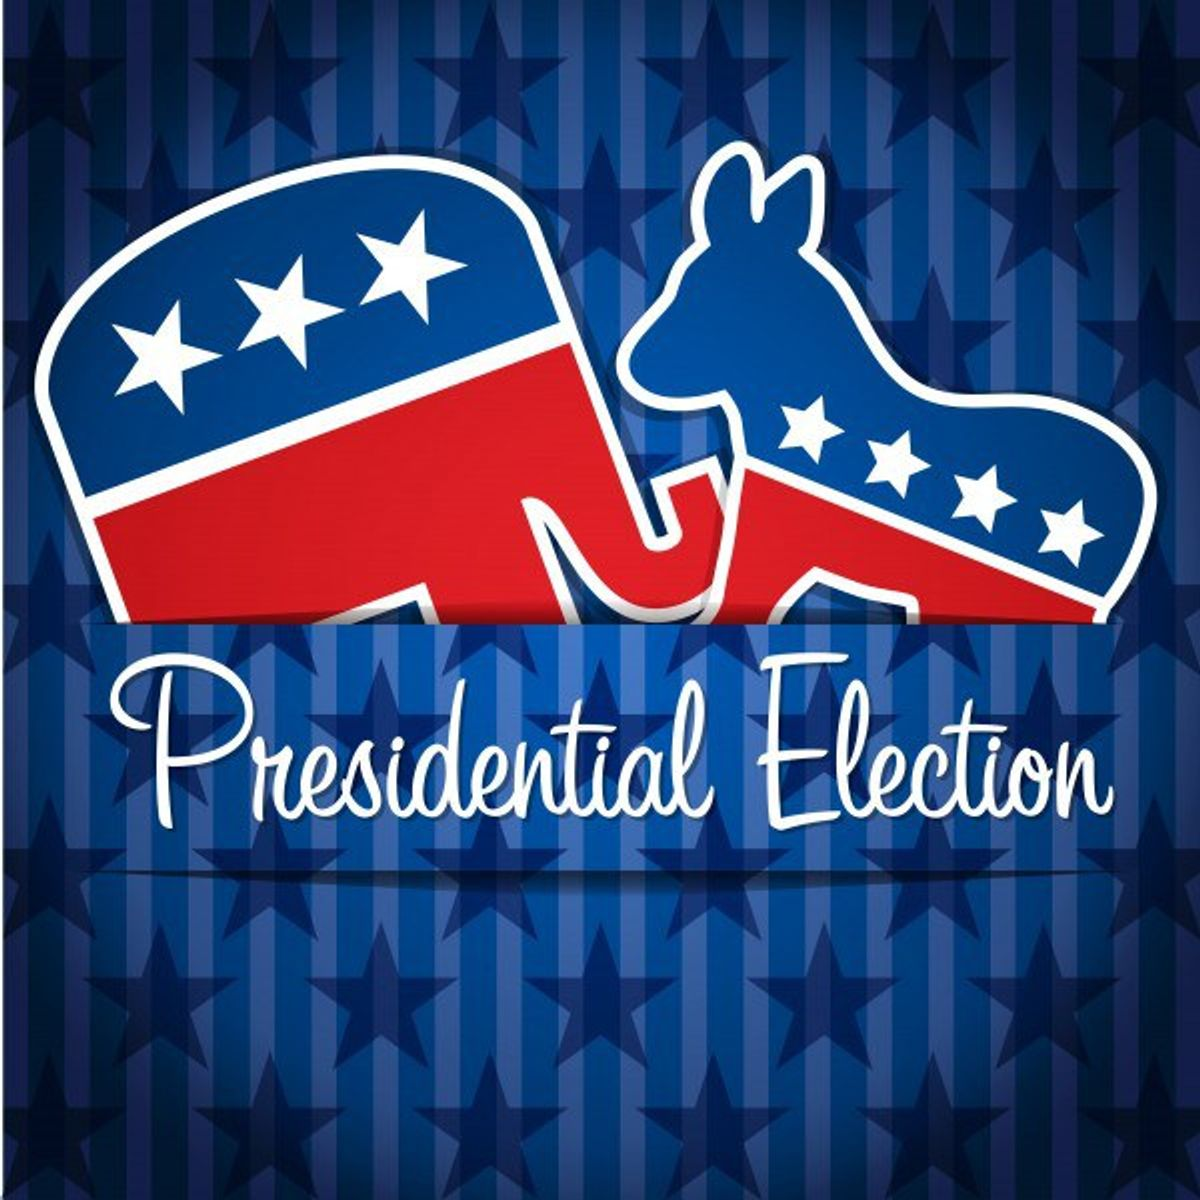 10 Things More Entertaining Than Watching The Presidential Debate